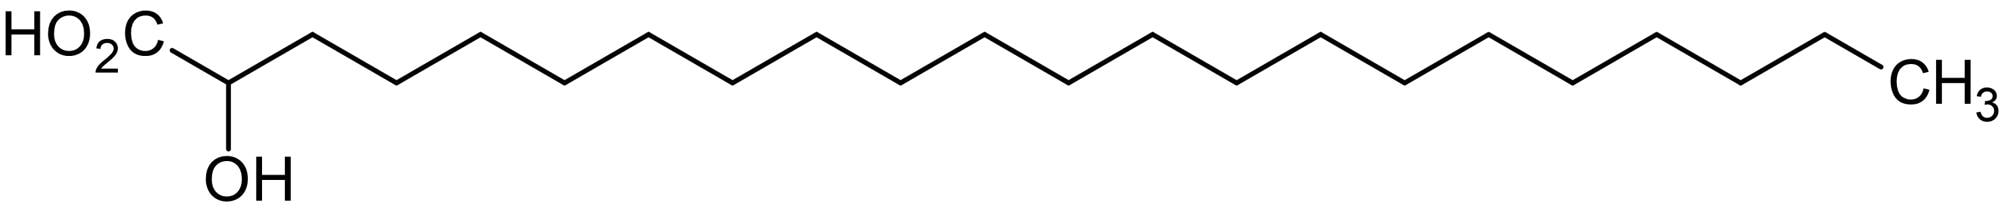 Chemical Structure - 2-Hydroxydocosanoic acid, 2-Hydroxy C22:0 fatty acid (ab144014)